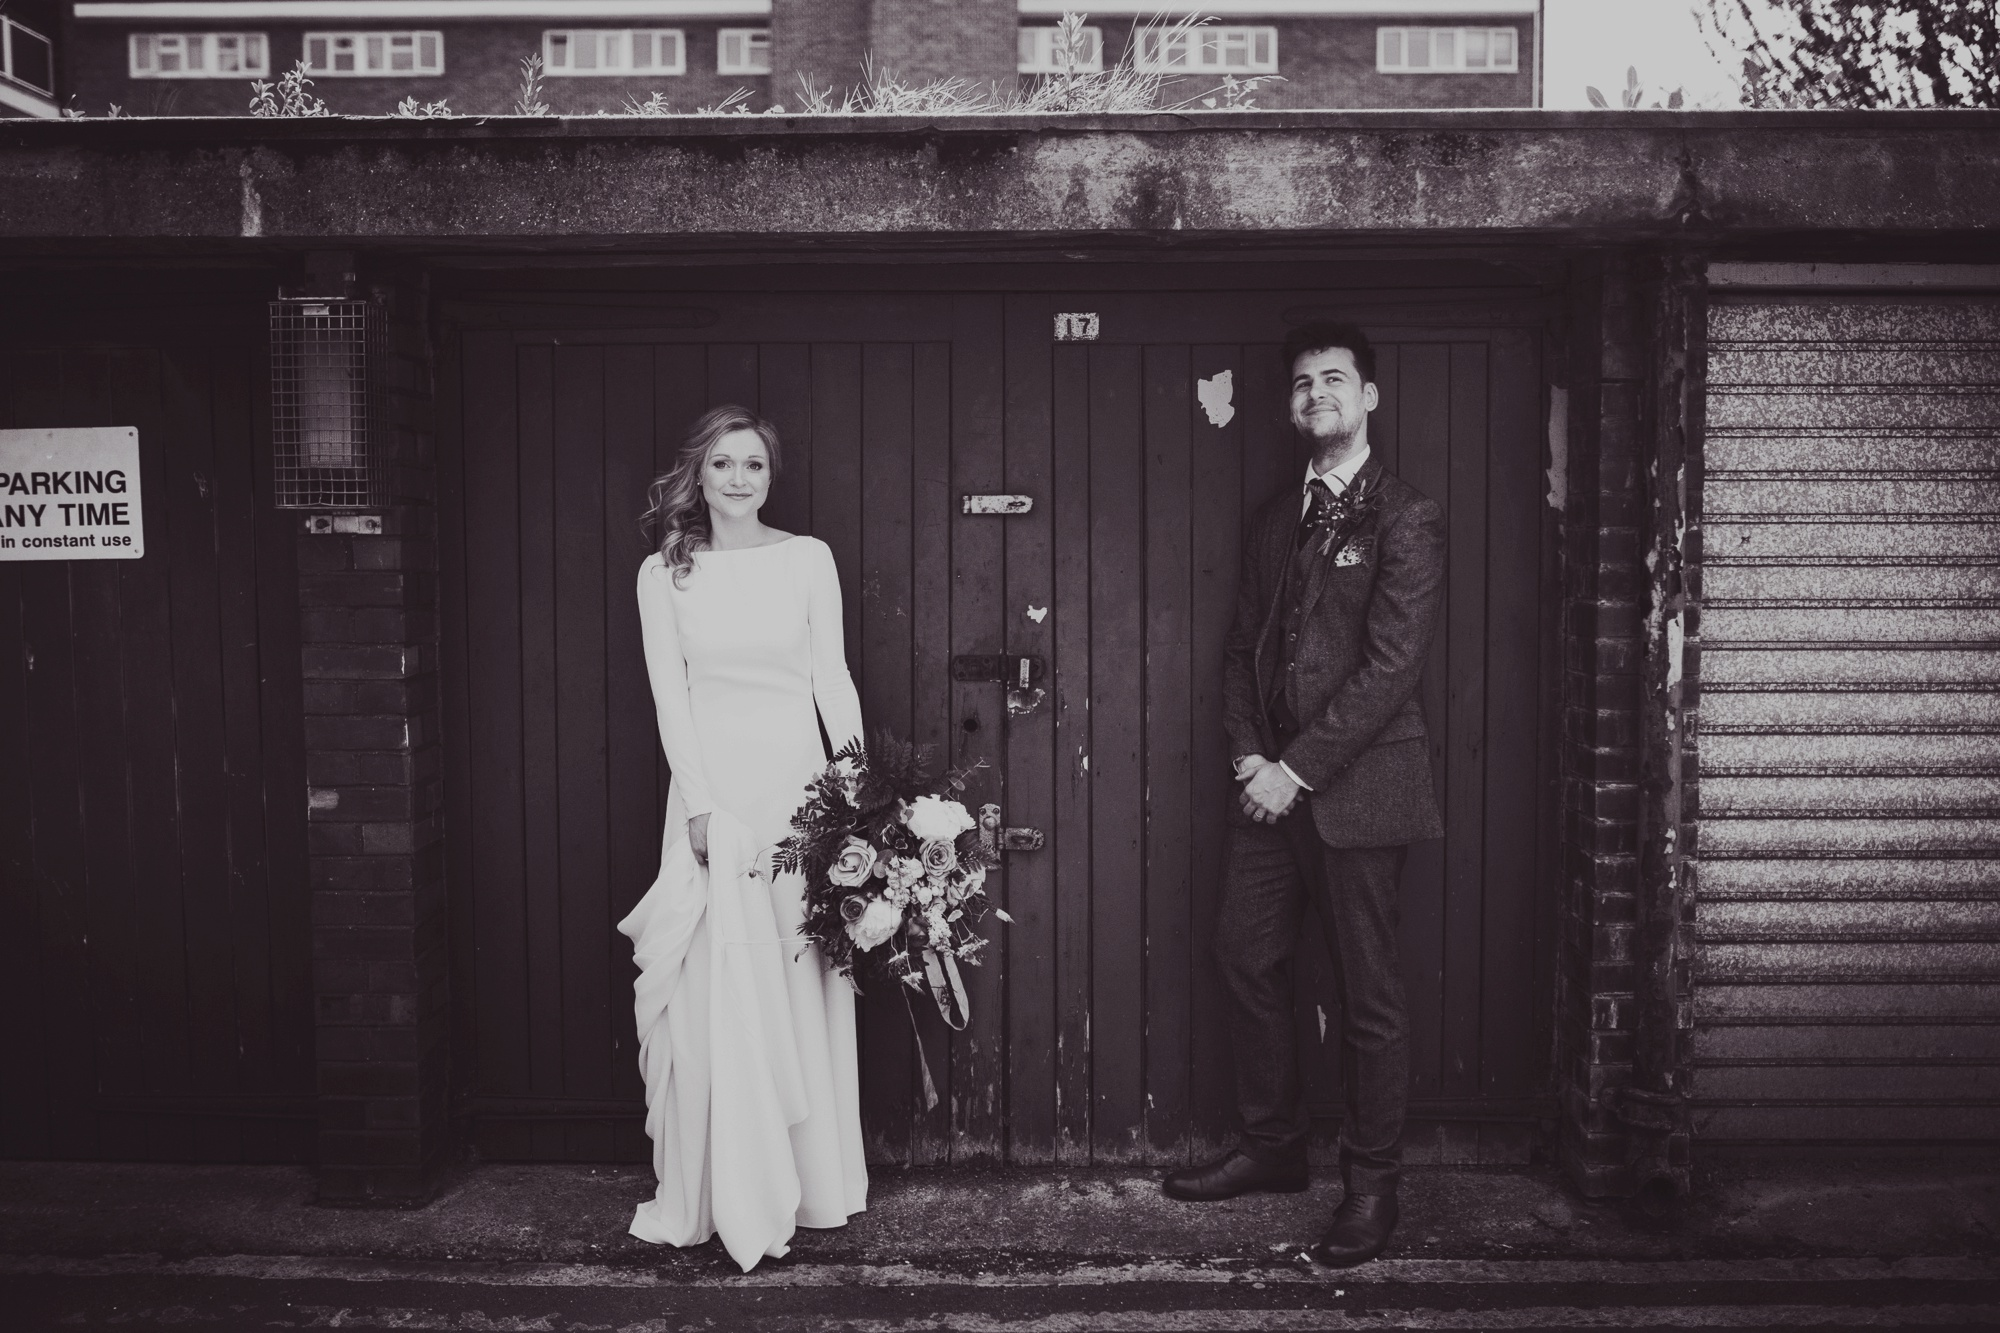 Emma + Michael SP // JJ Wimborne, N1